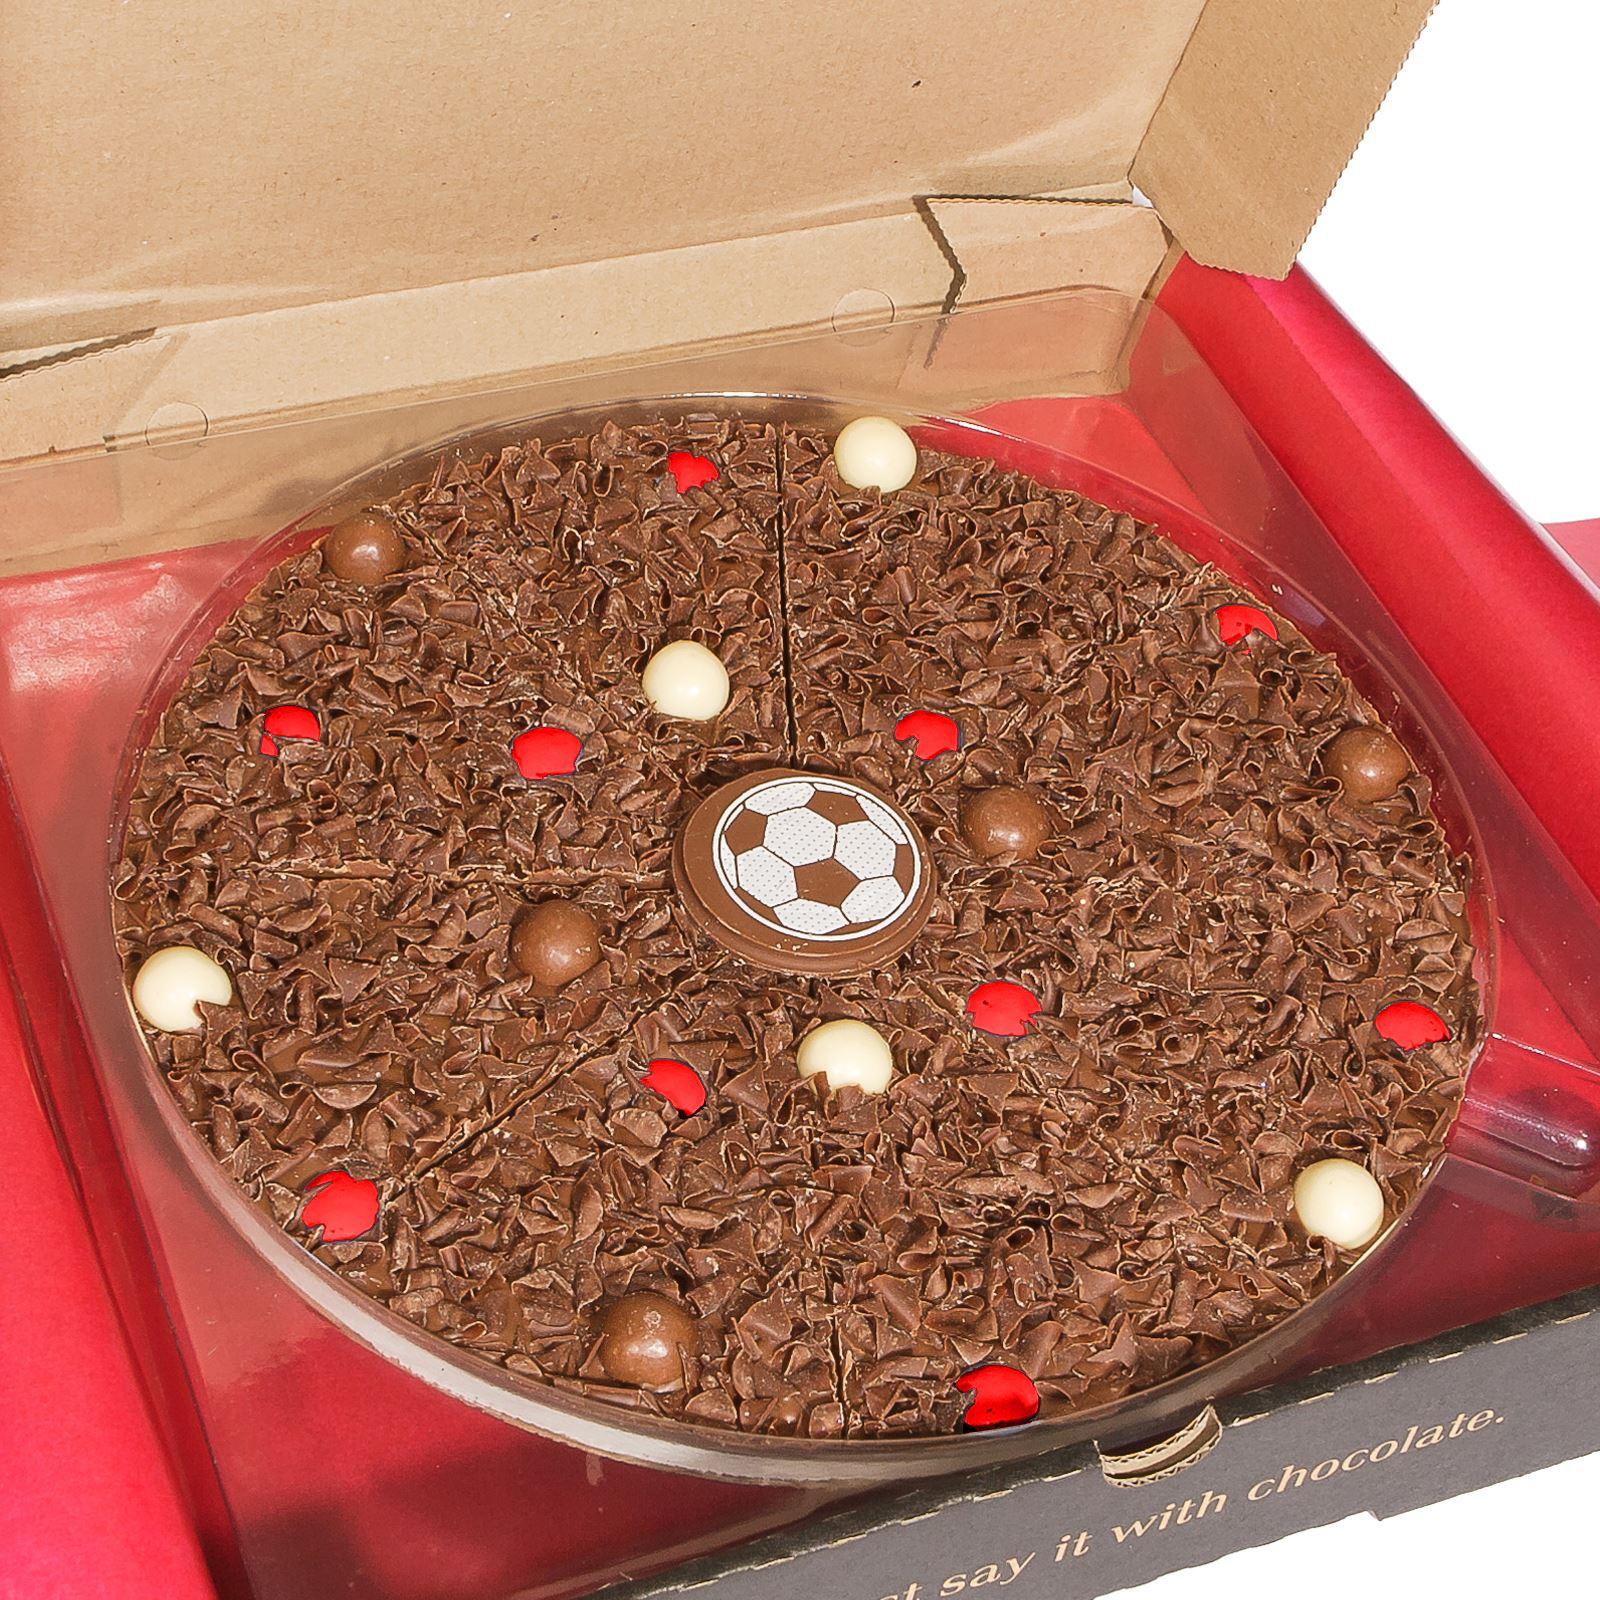 25.4cm Inch Gourmet Chocolate Pizza Belgian Milk Choc Gift